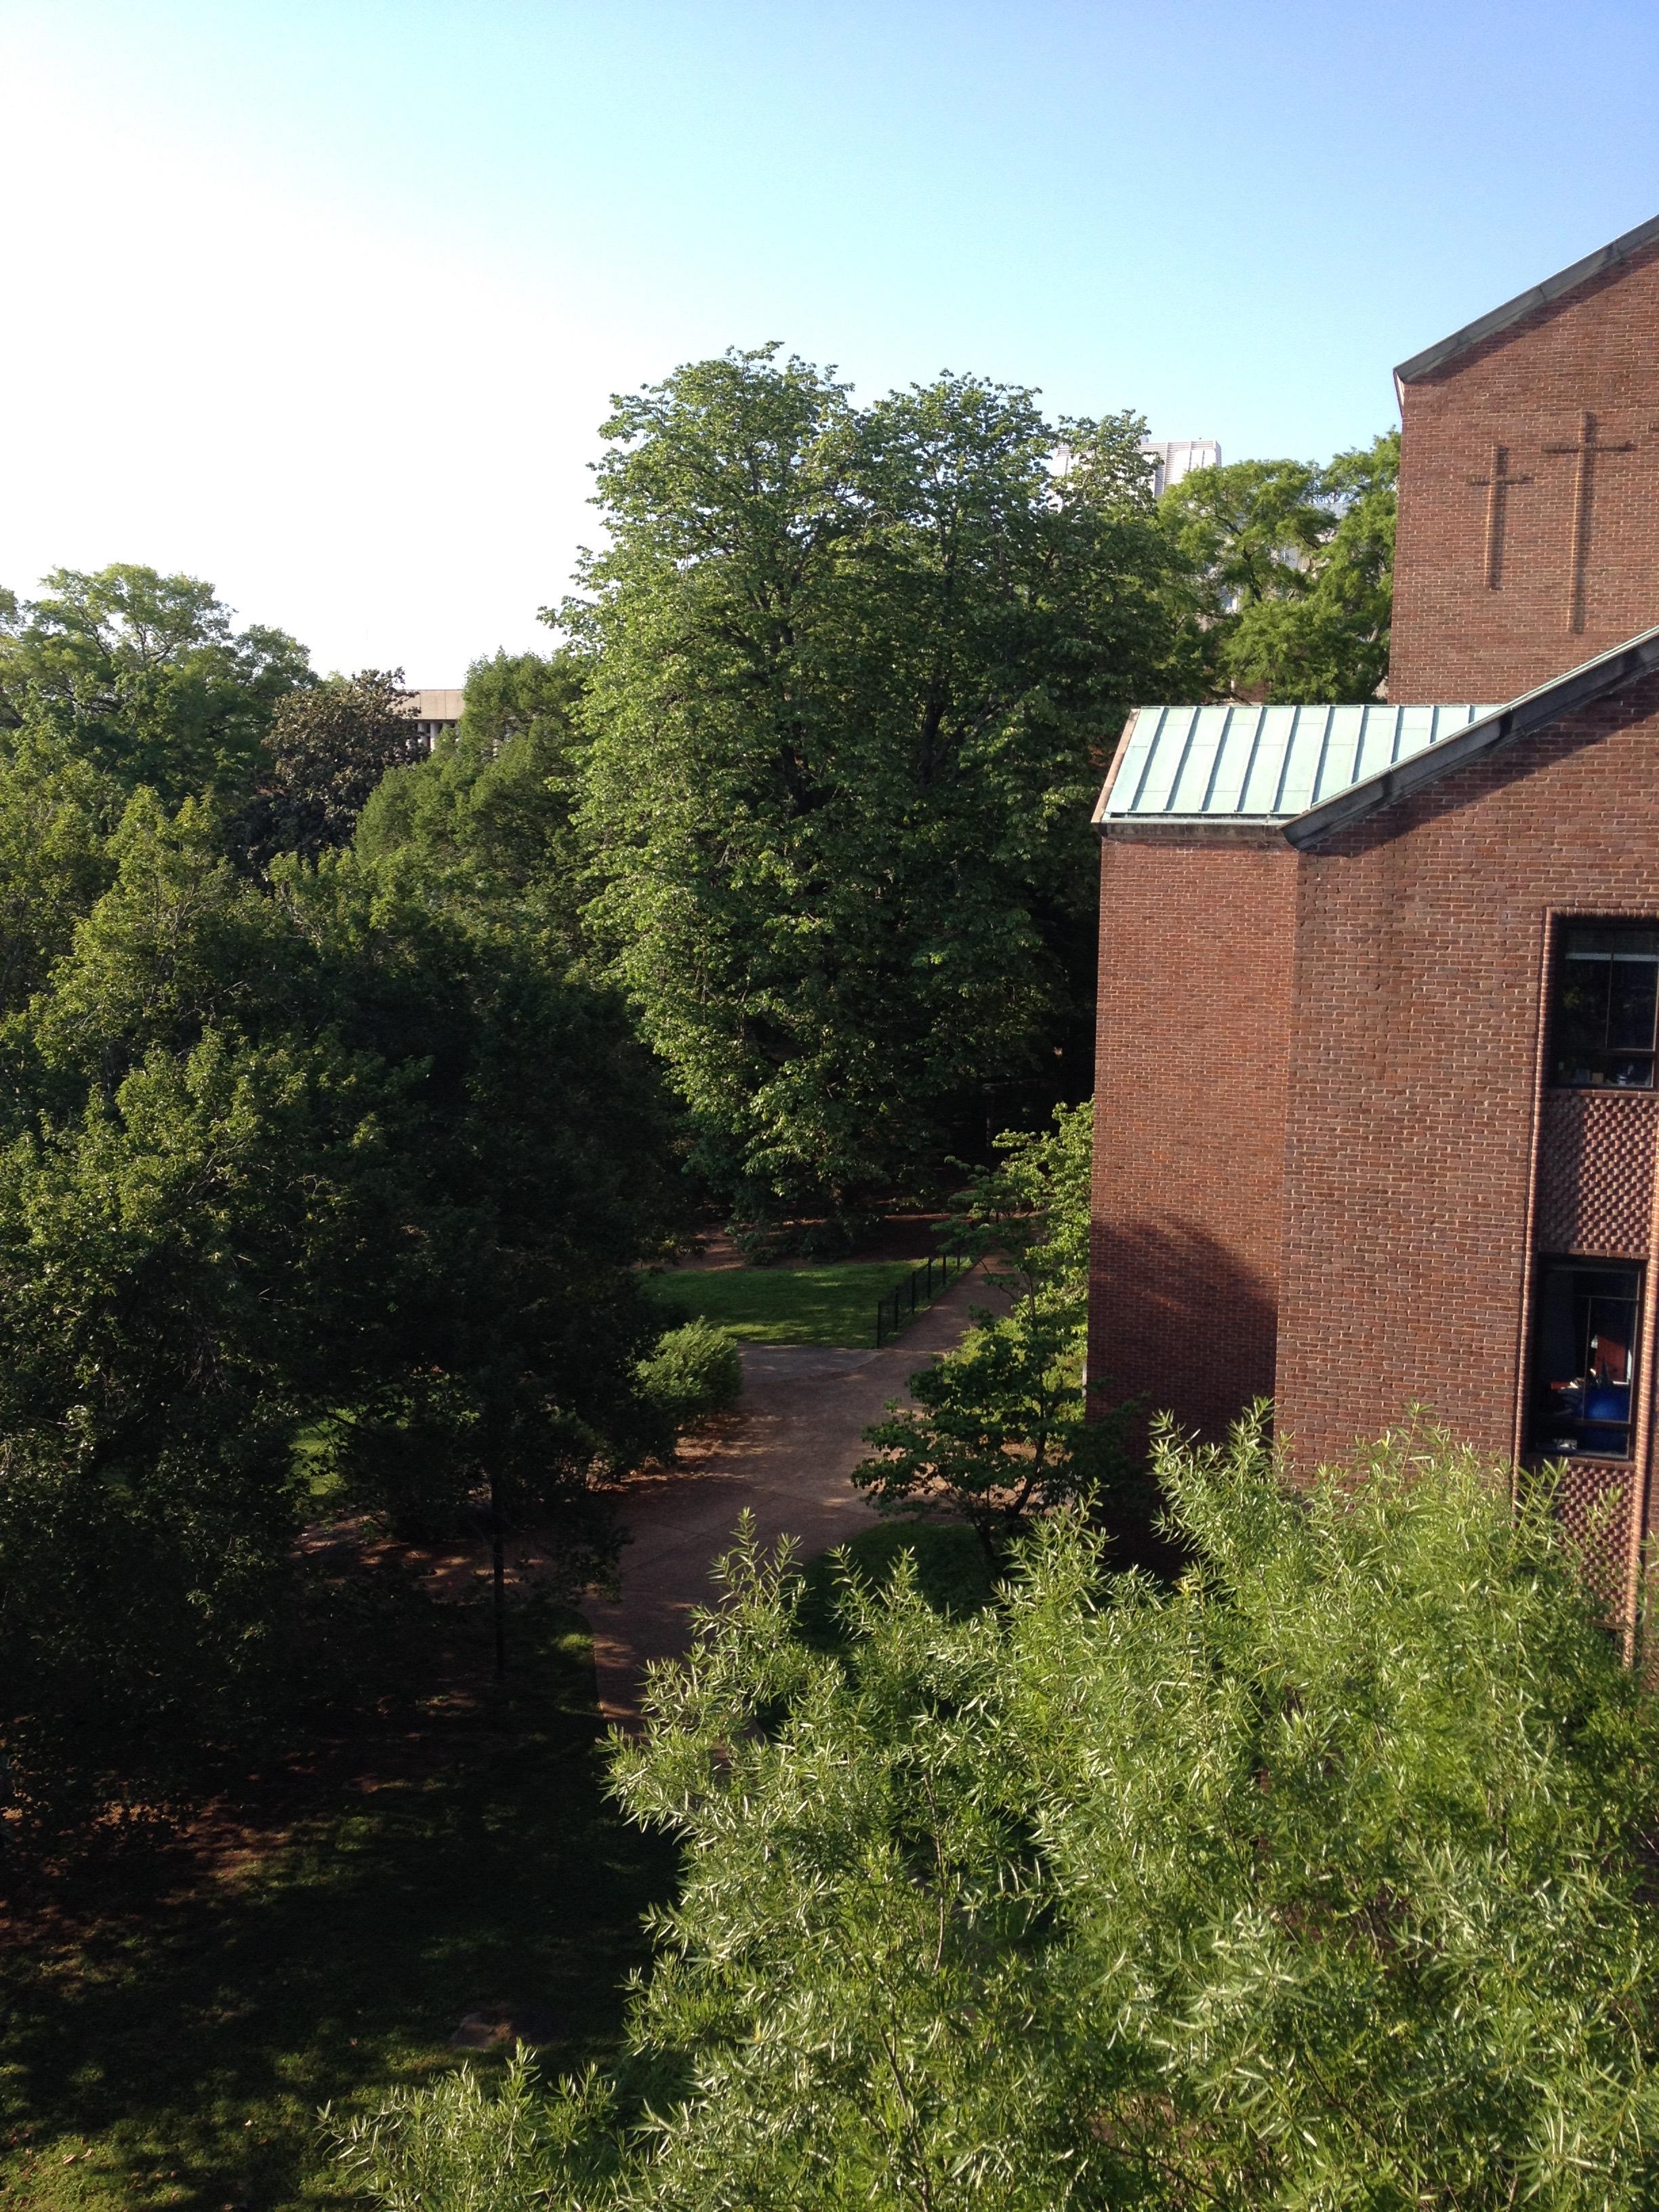 Divinity School Addition, Divinity School, Vanderbilt University